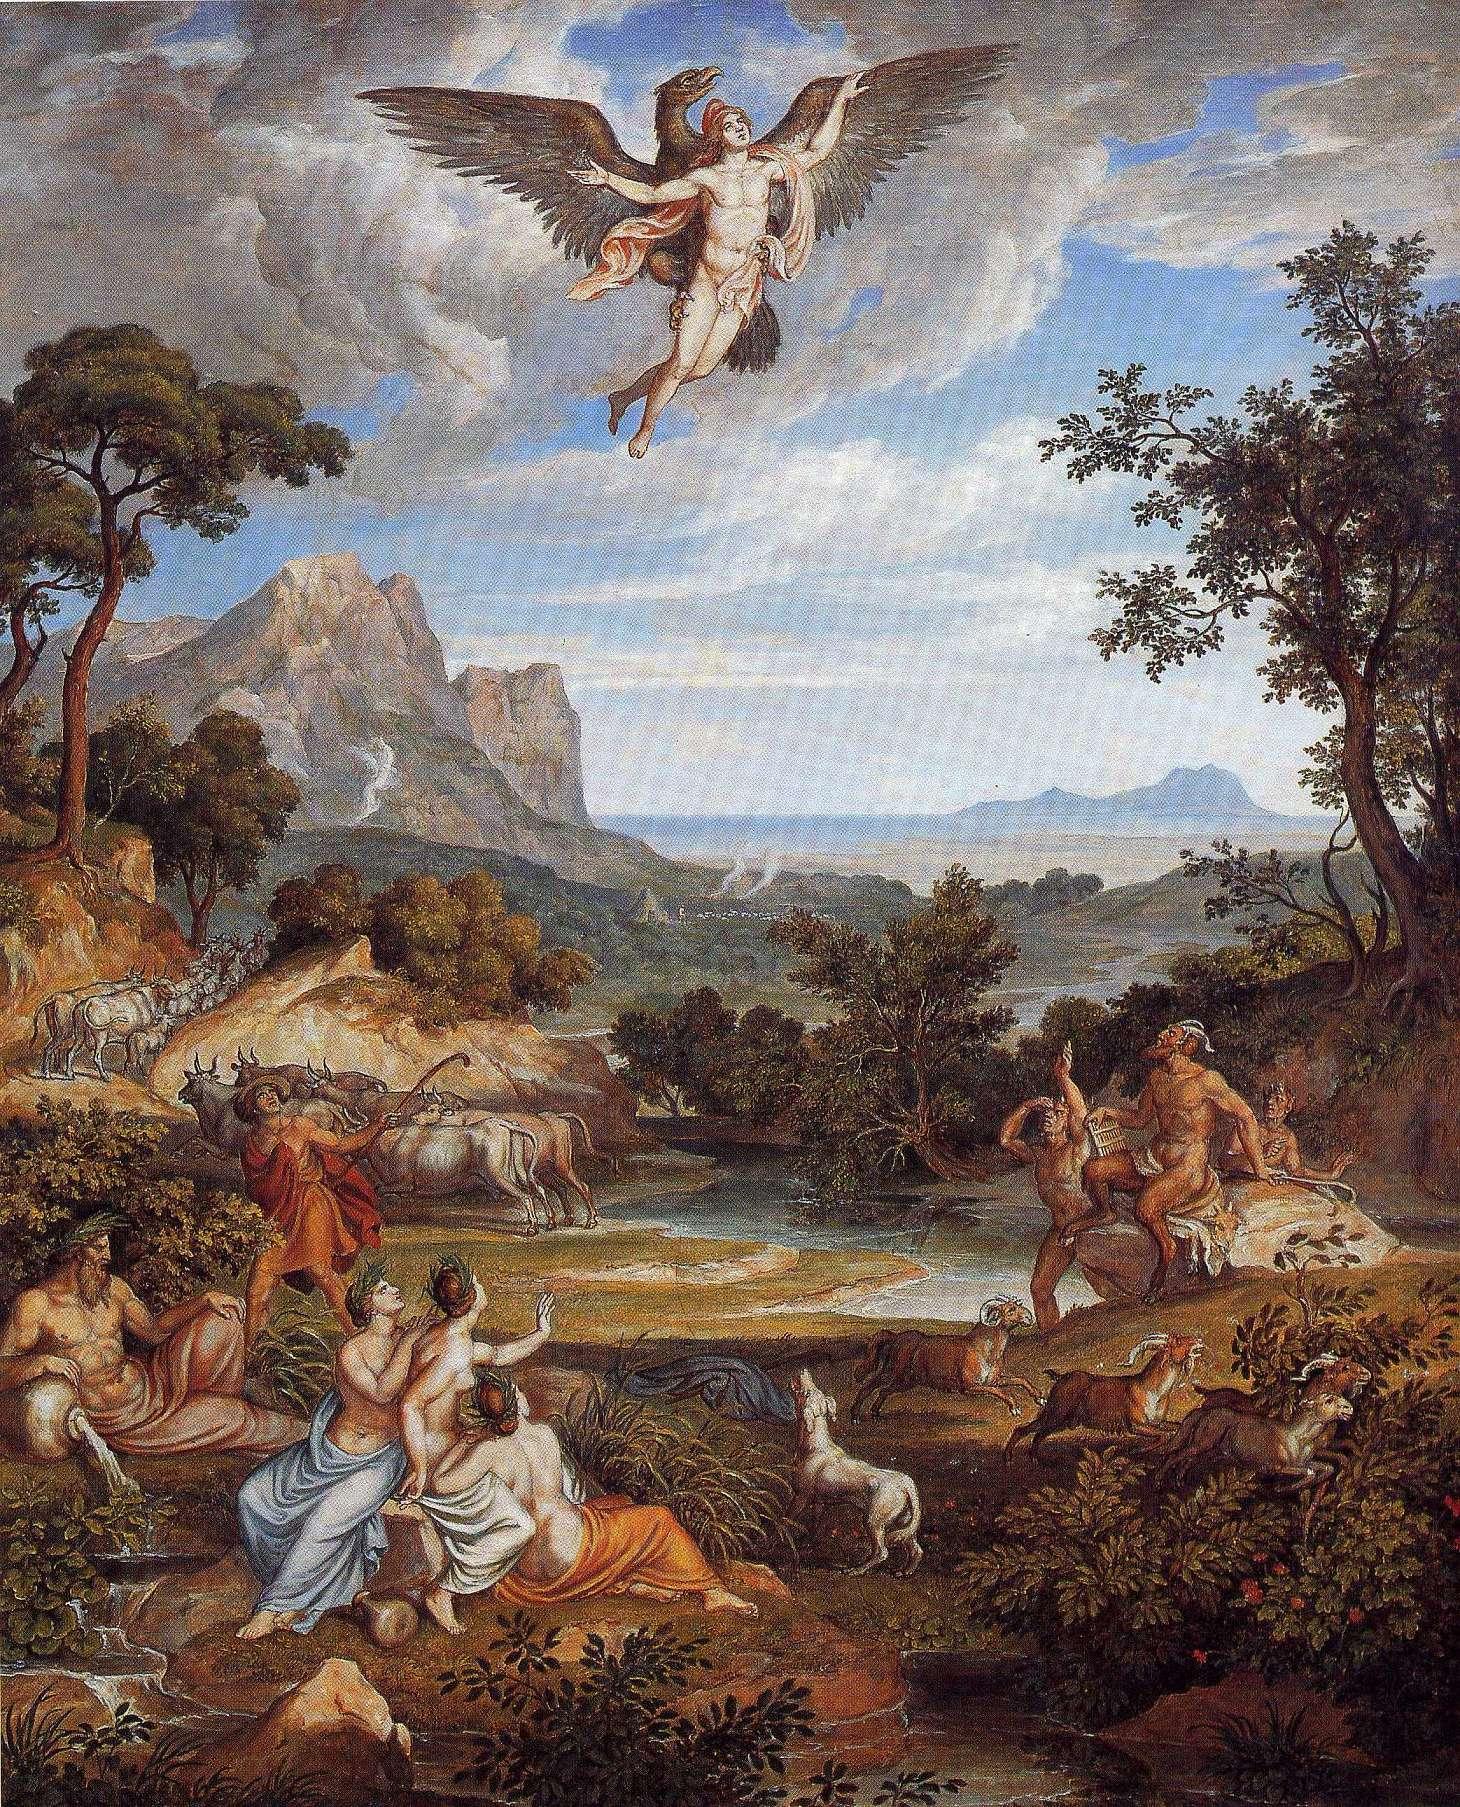 Raub von Ganymed